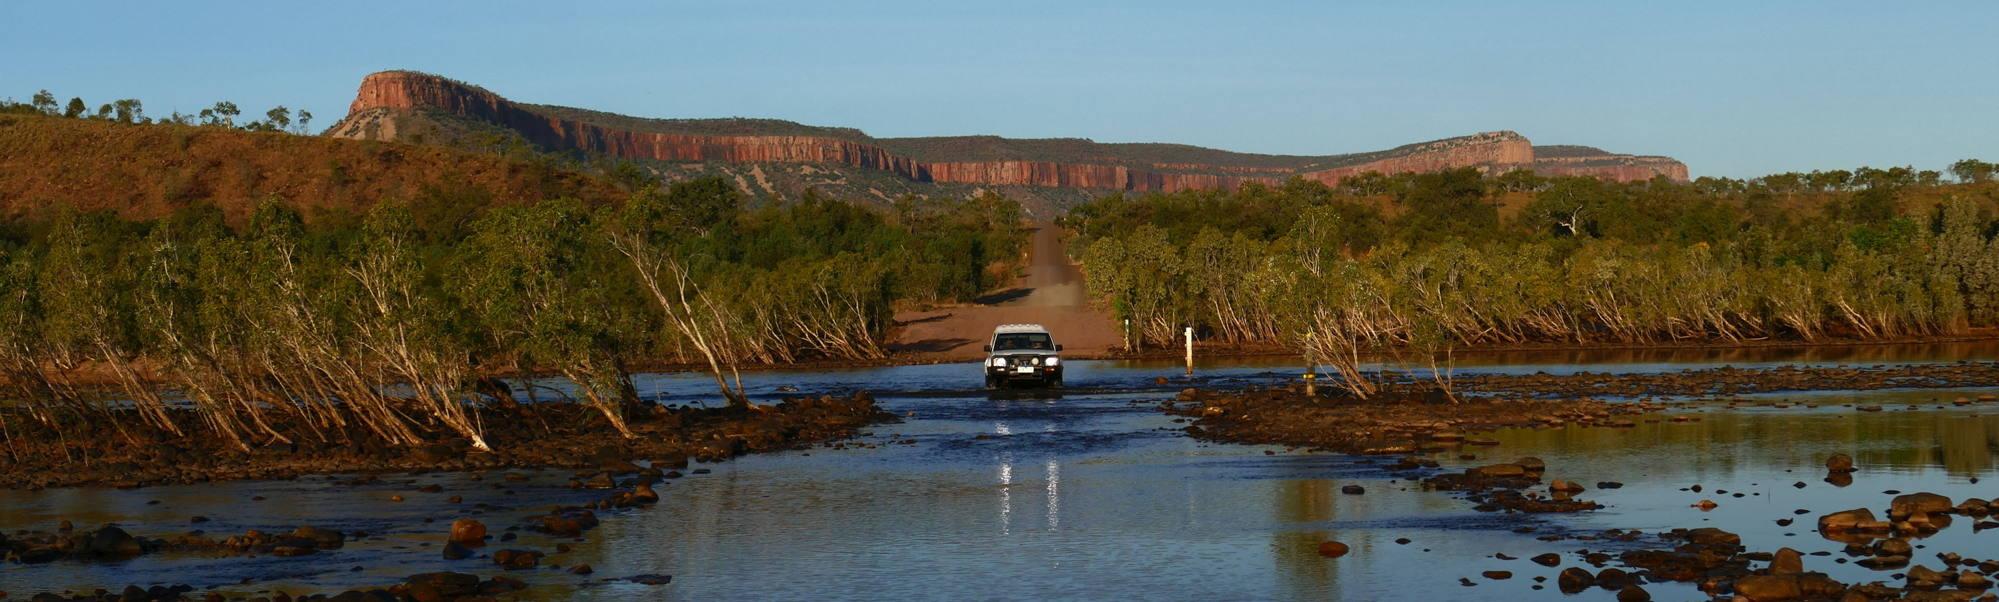 Pentacost River_crossing_Cockburn Range1w